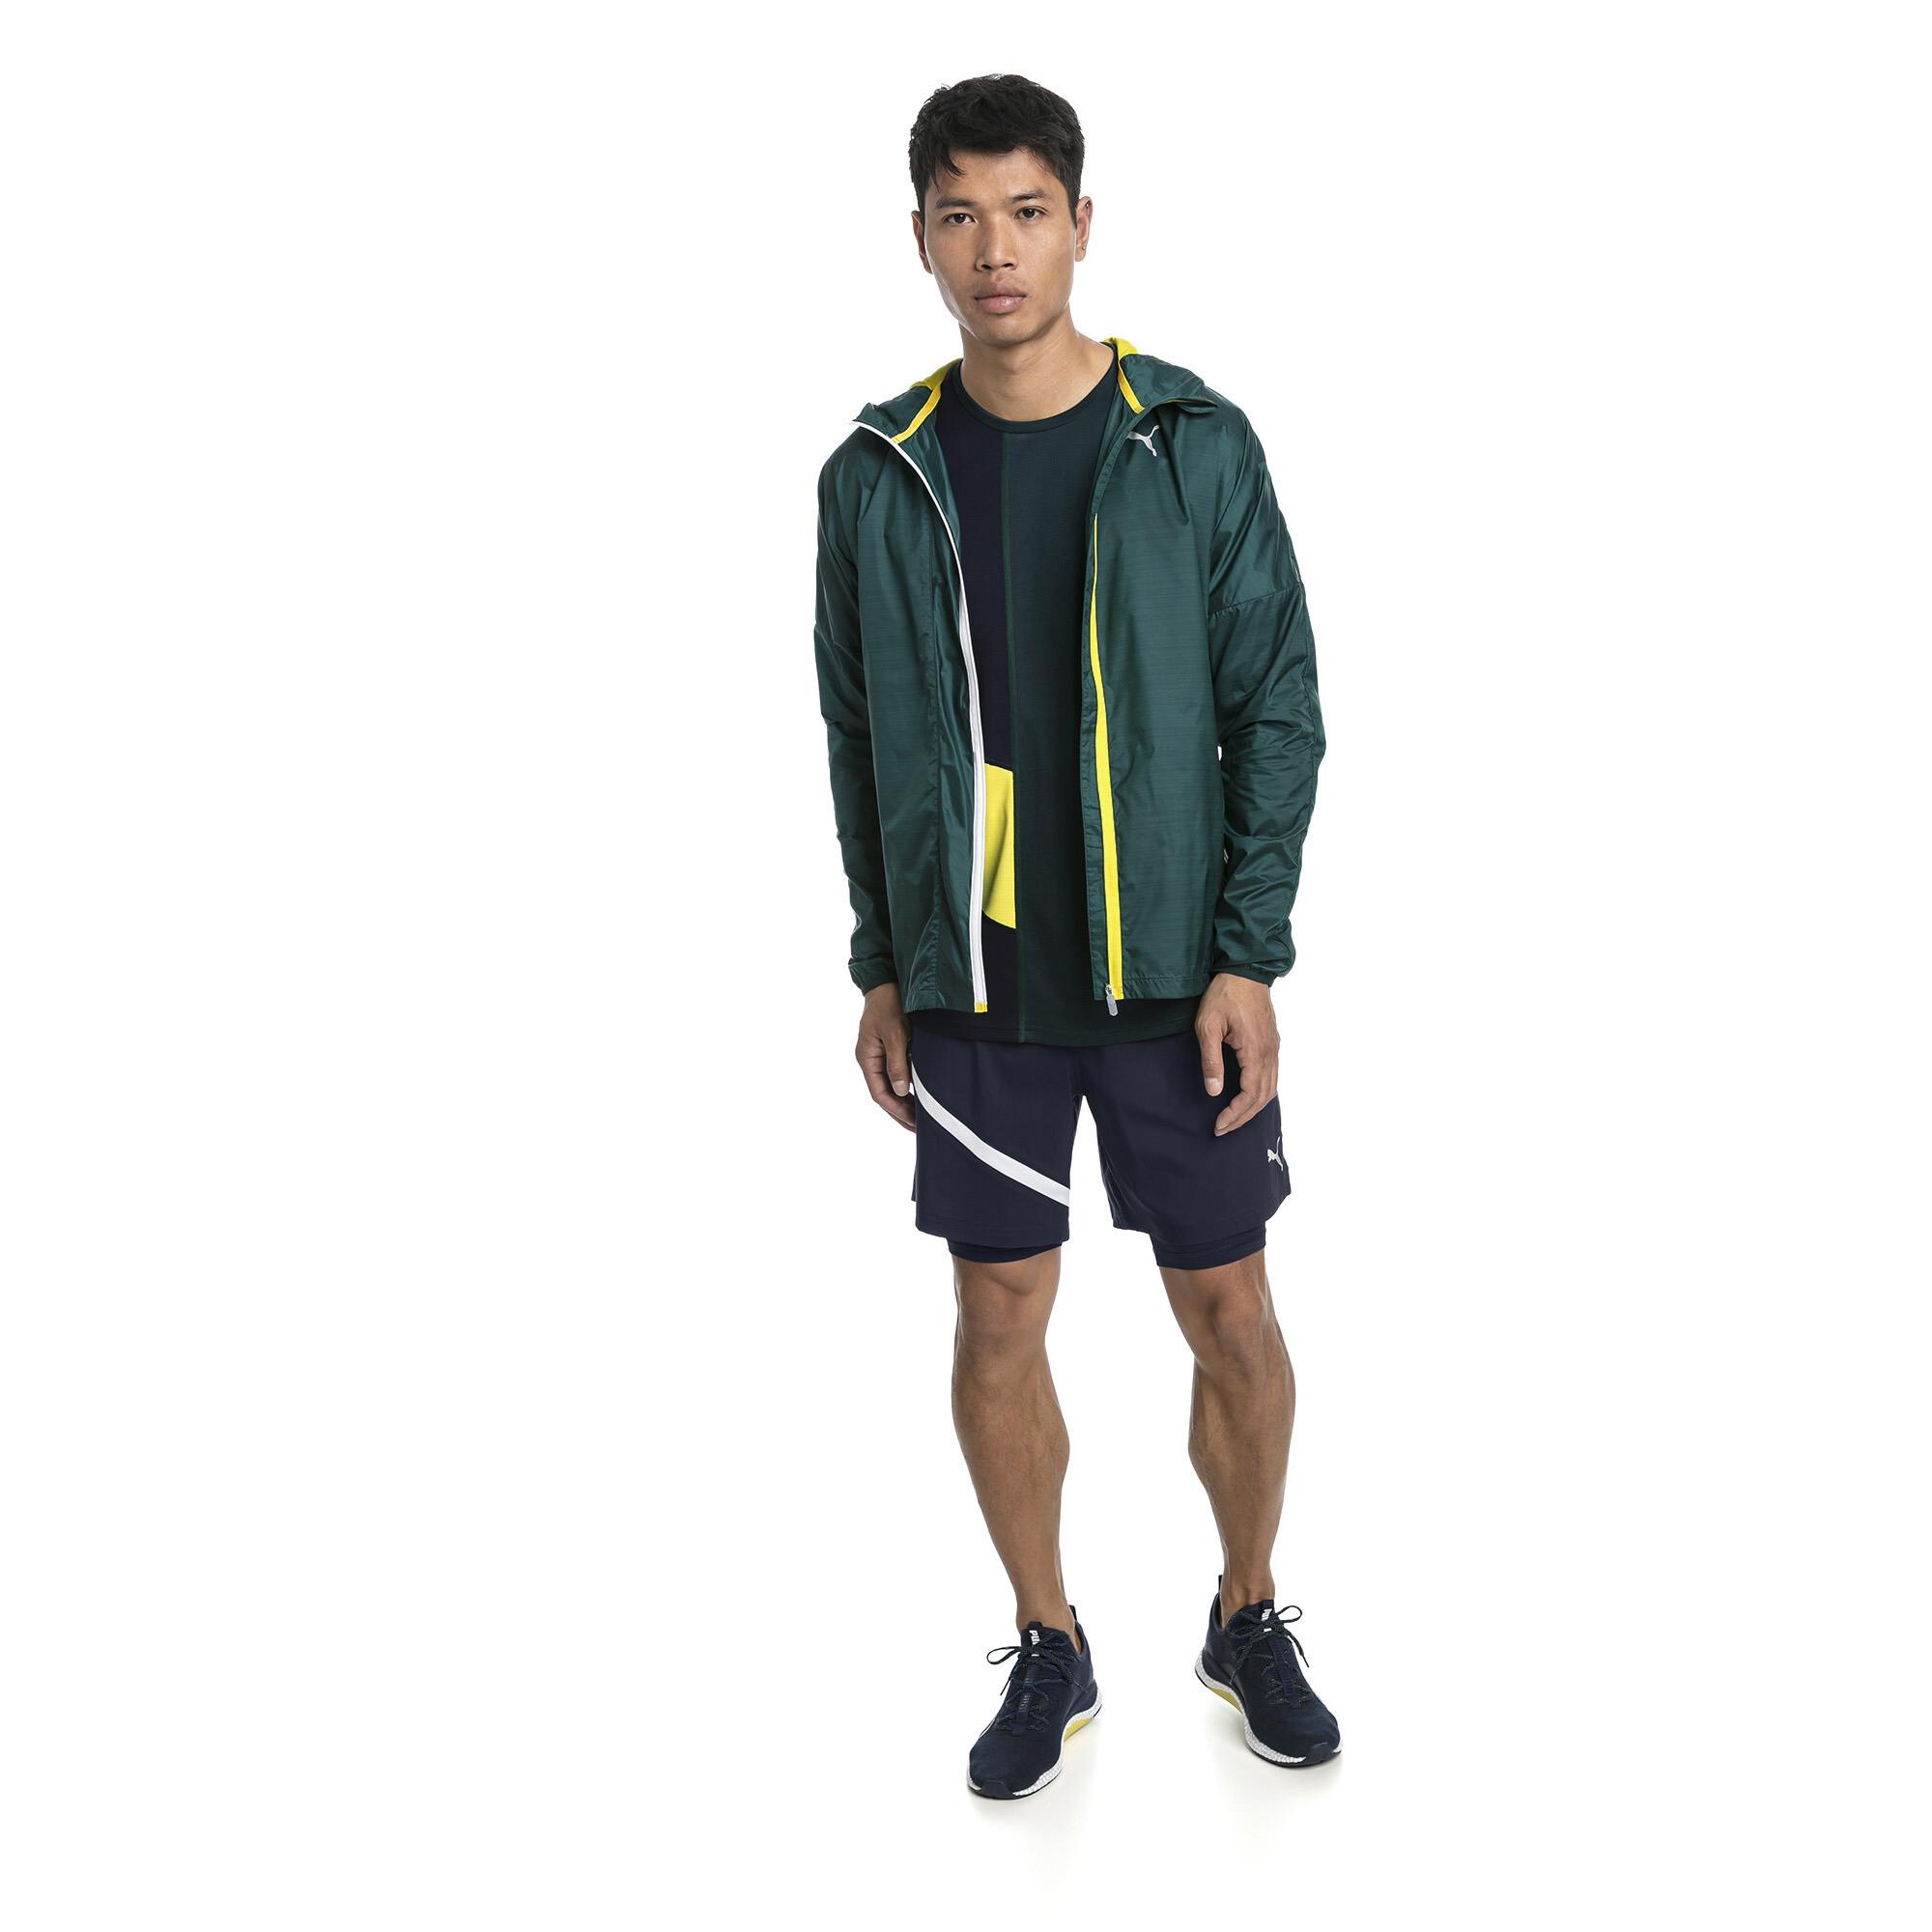 Image Puma Ignite Woven 2 in 1 Men's Running Shorts #3